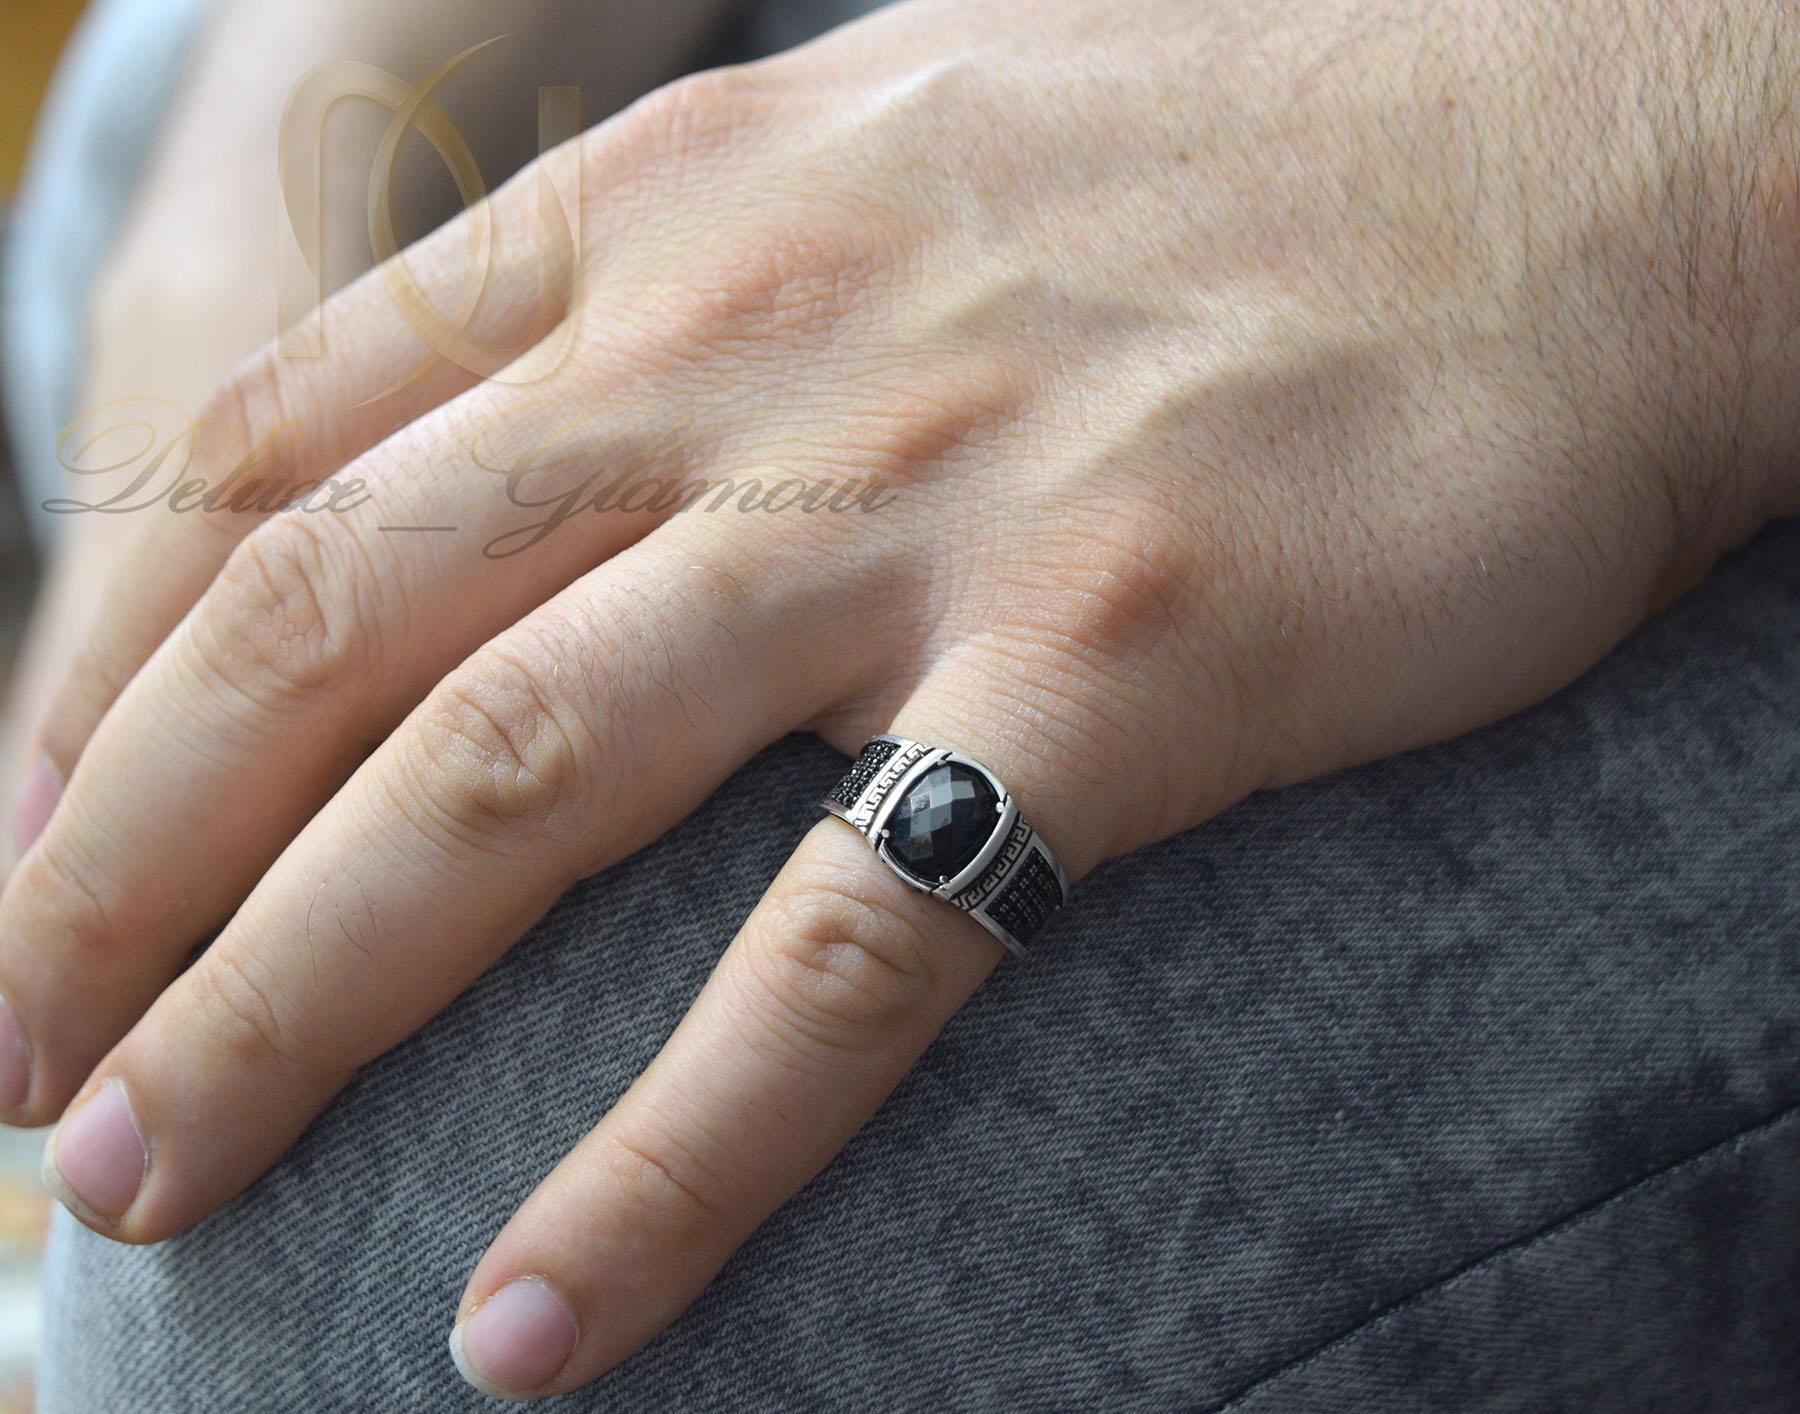 انگشتر مردانه نقره اسپرت نگین عقیق rg-n387